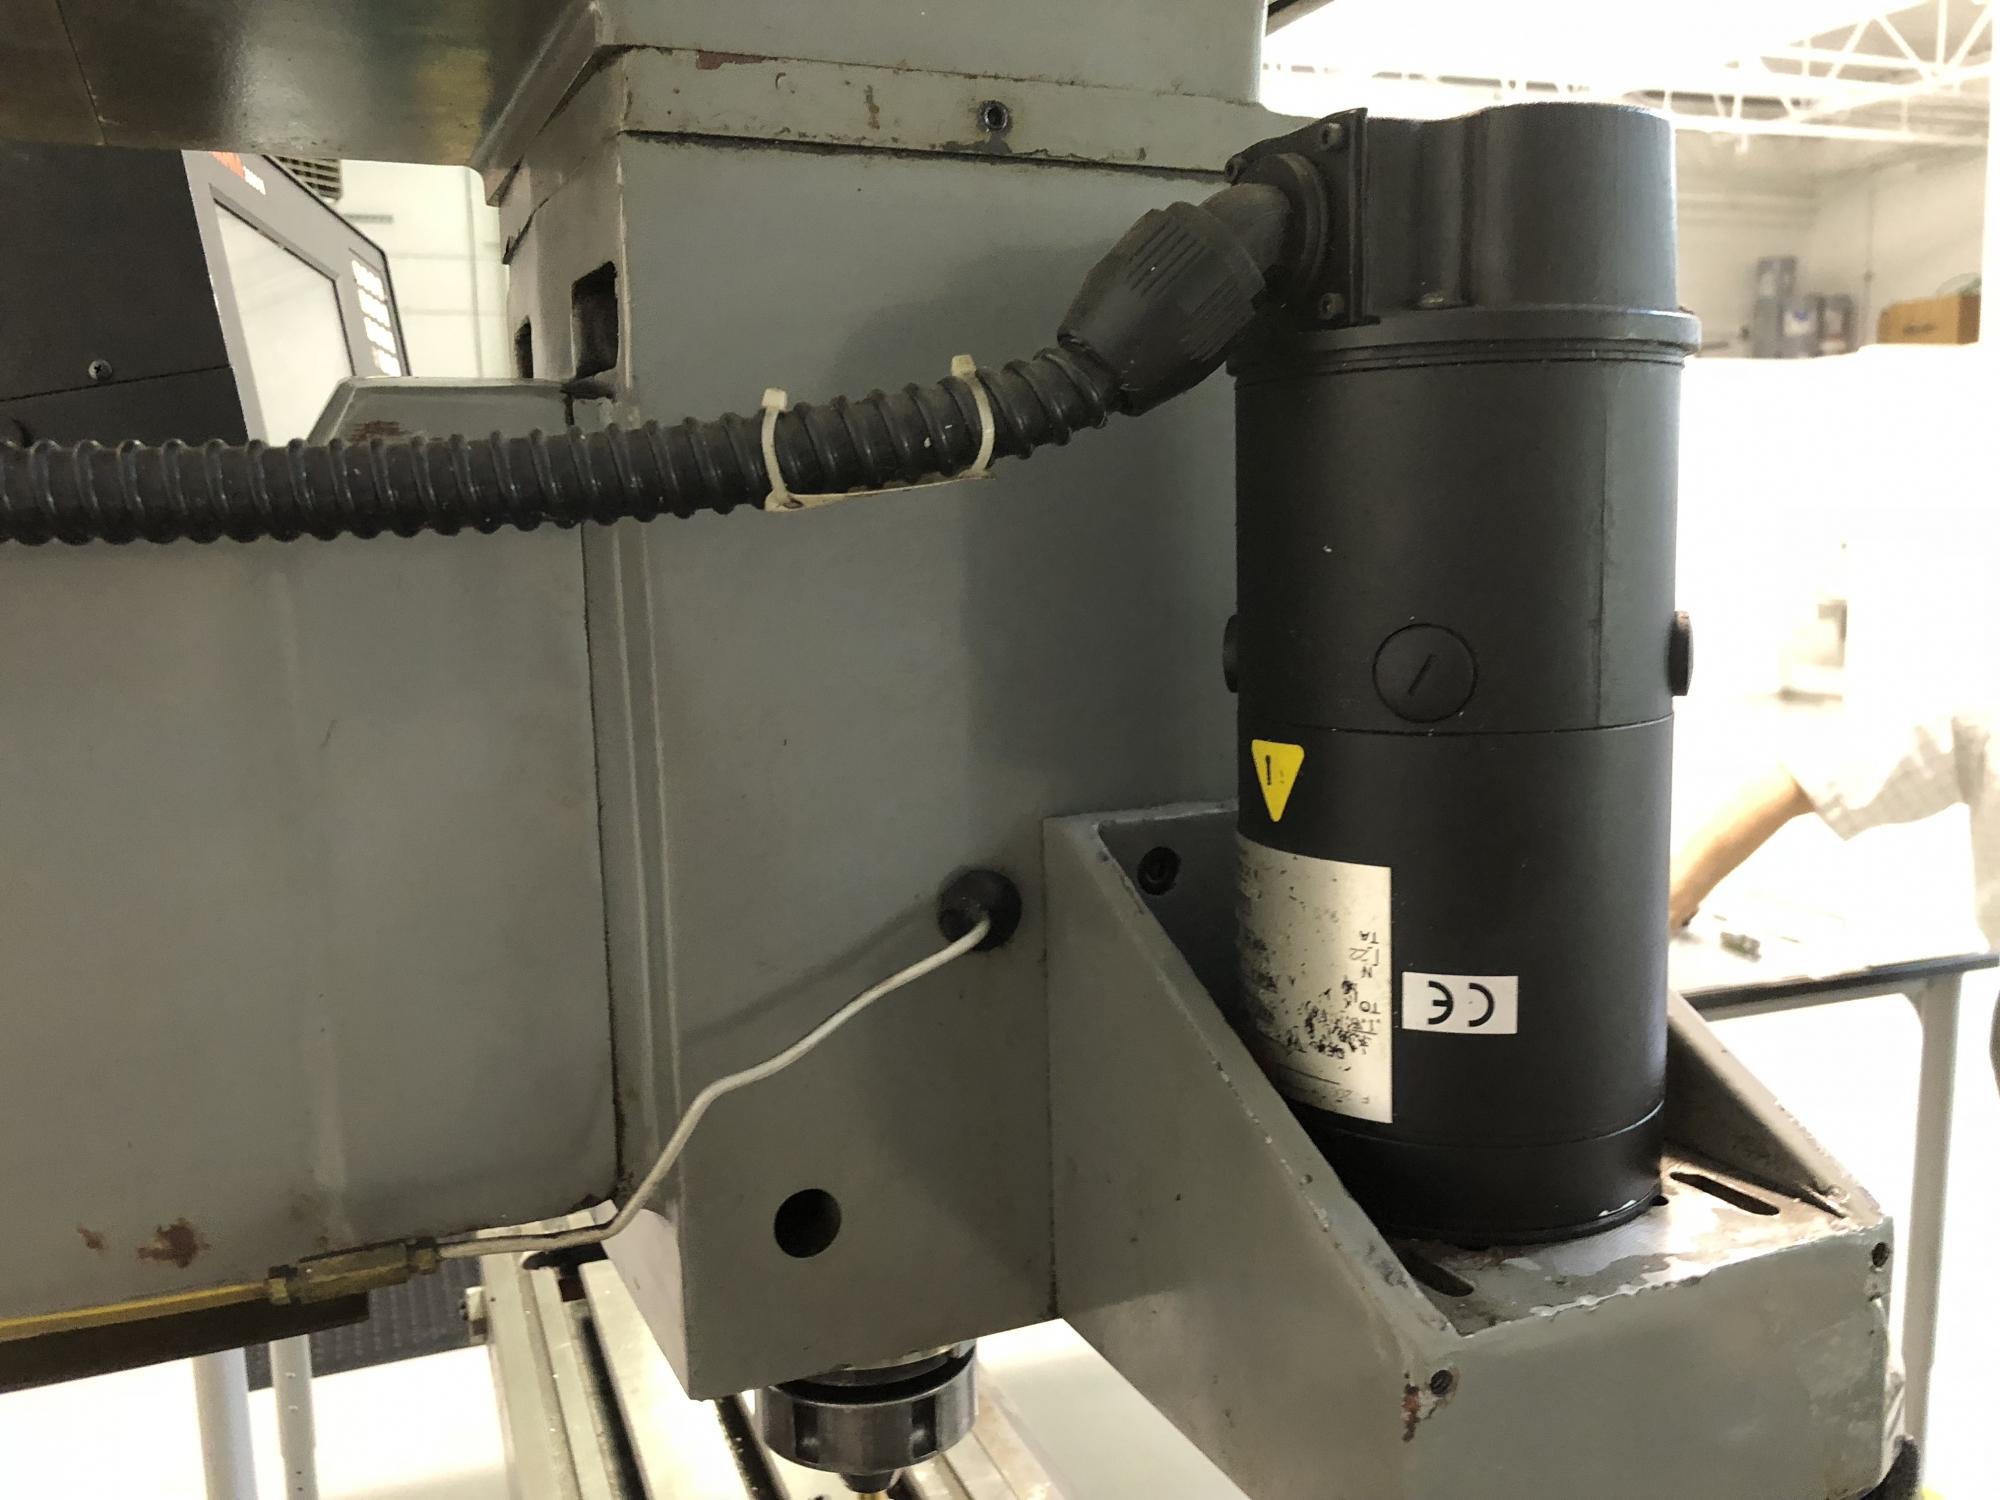 1989 YCM 40 Knee Mill